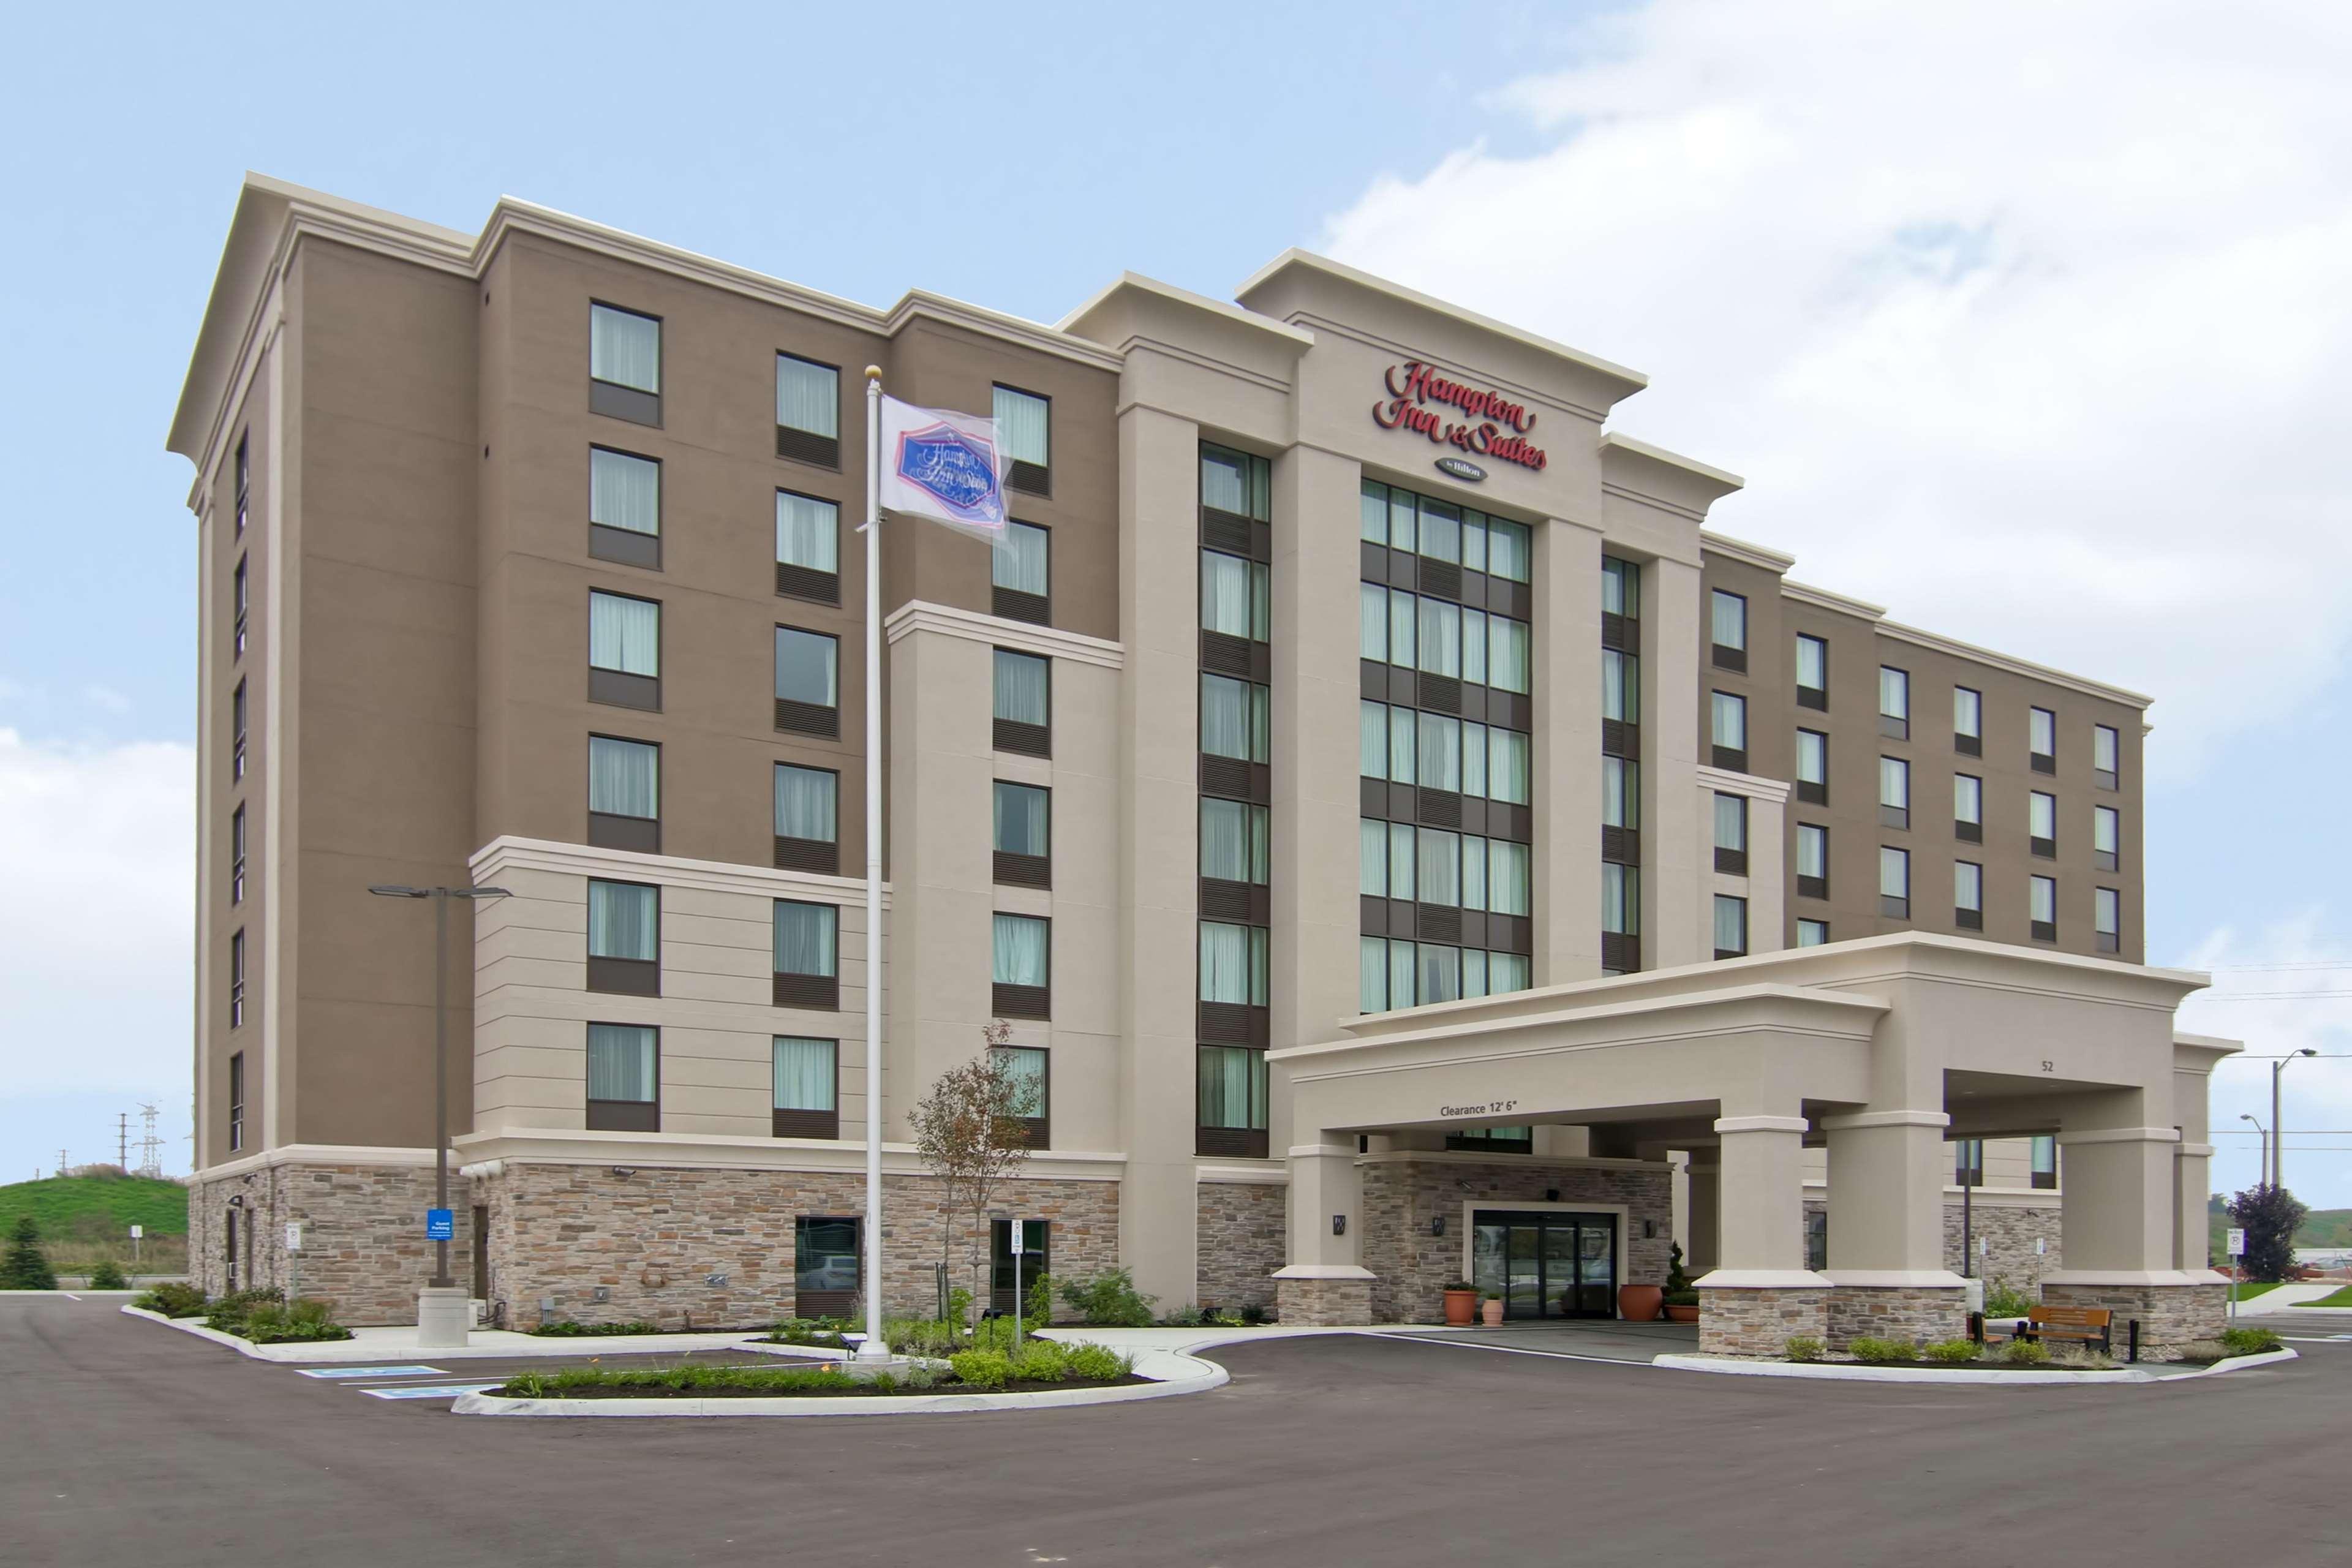 Hampton Inn & Suites by Hilton Toronto Markham